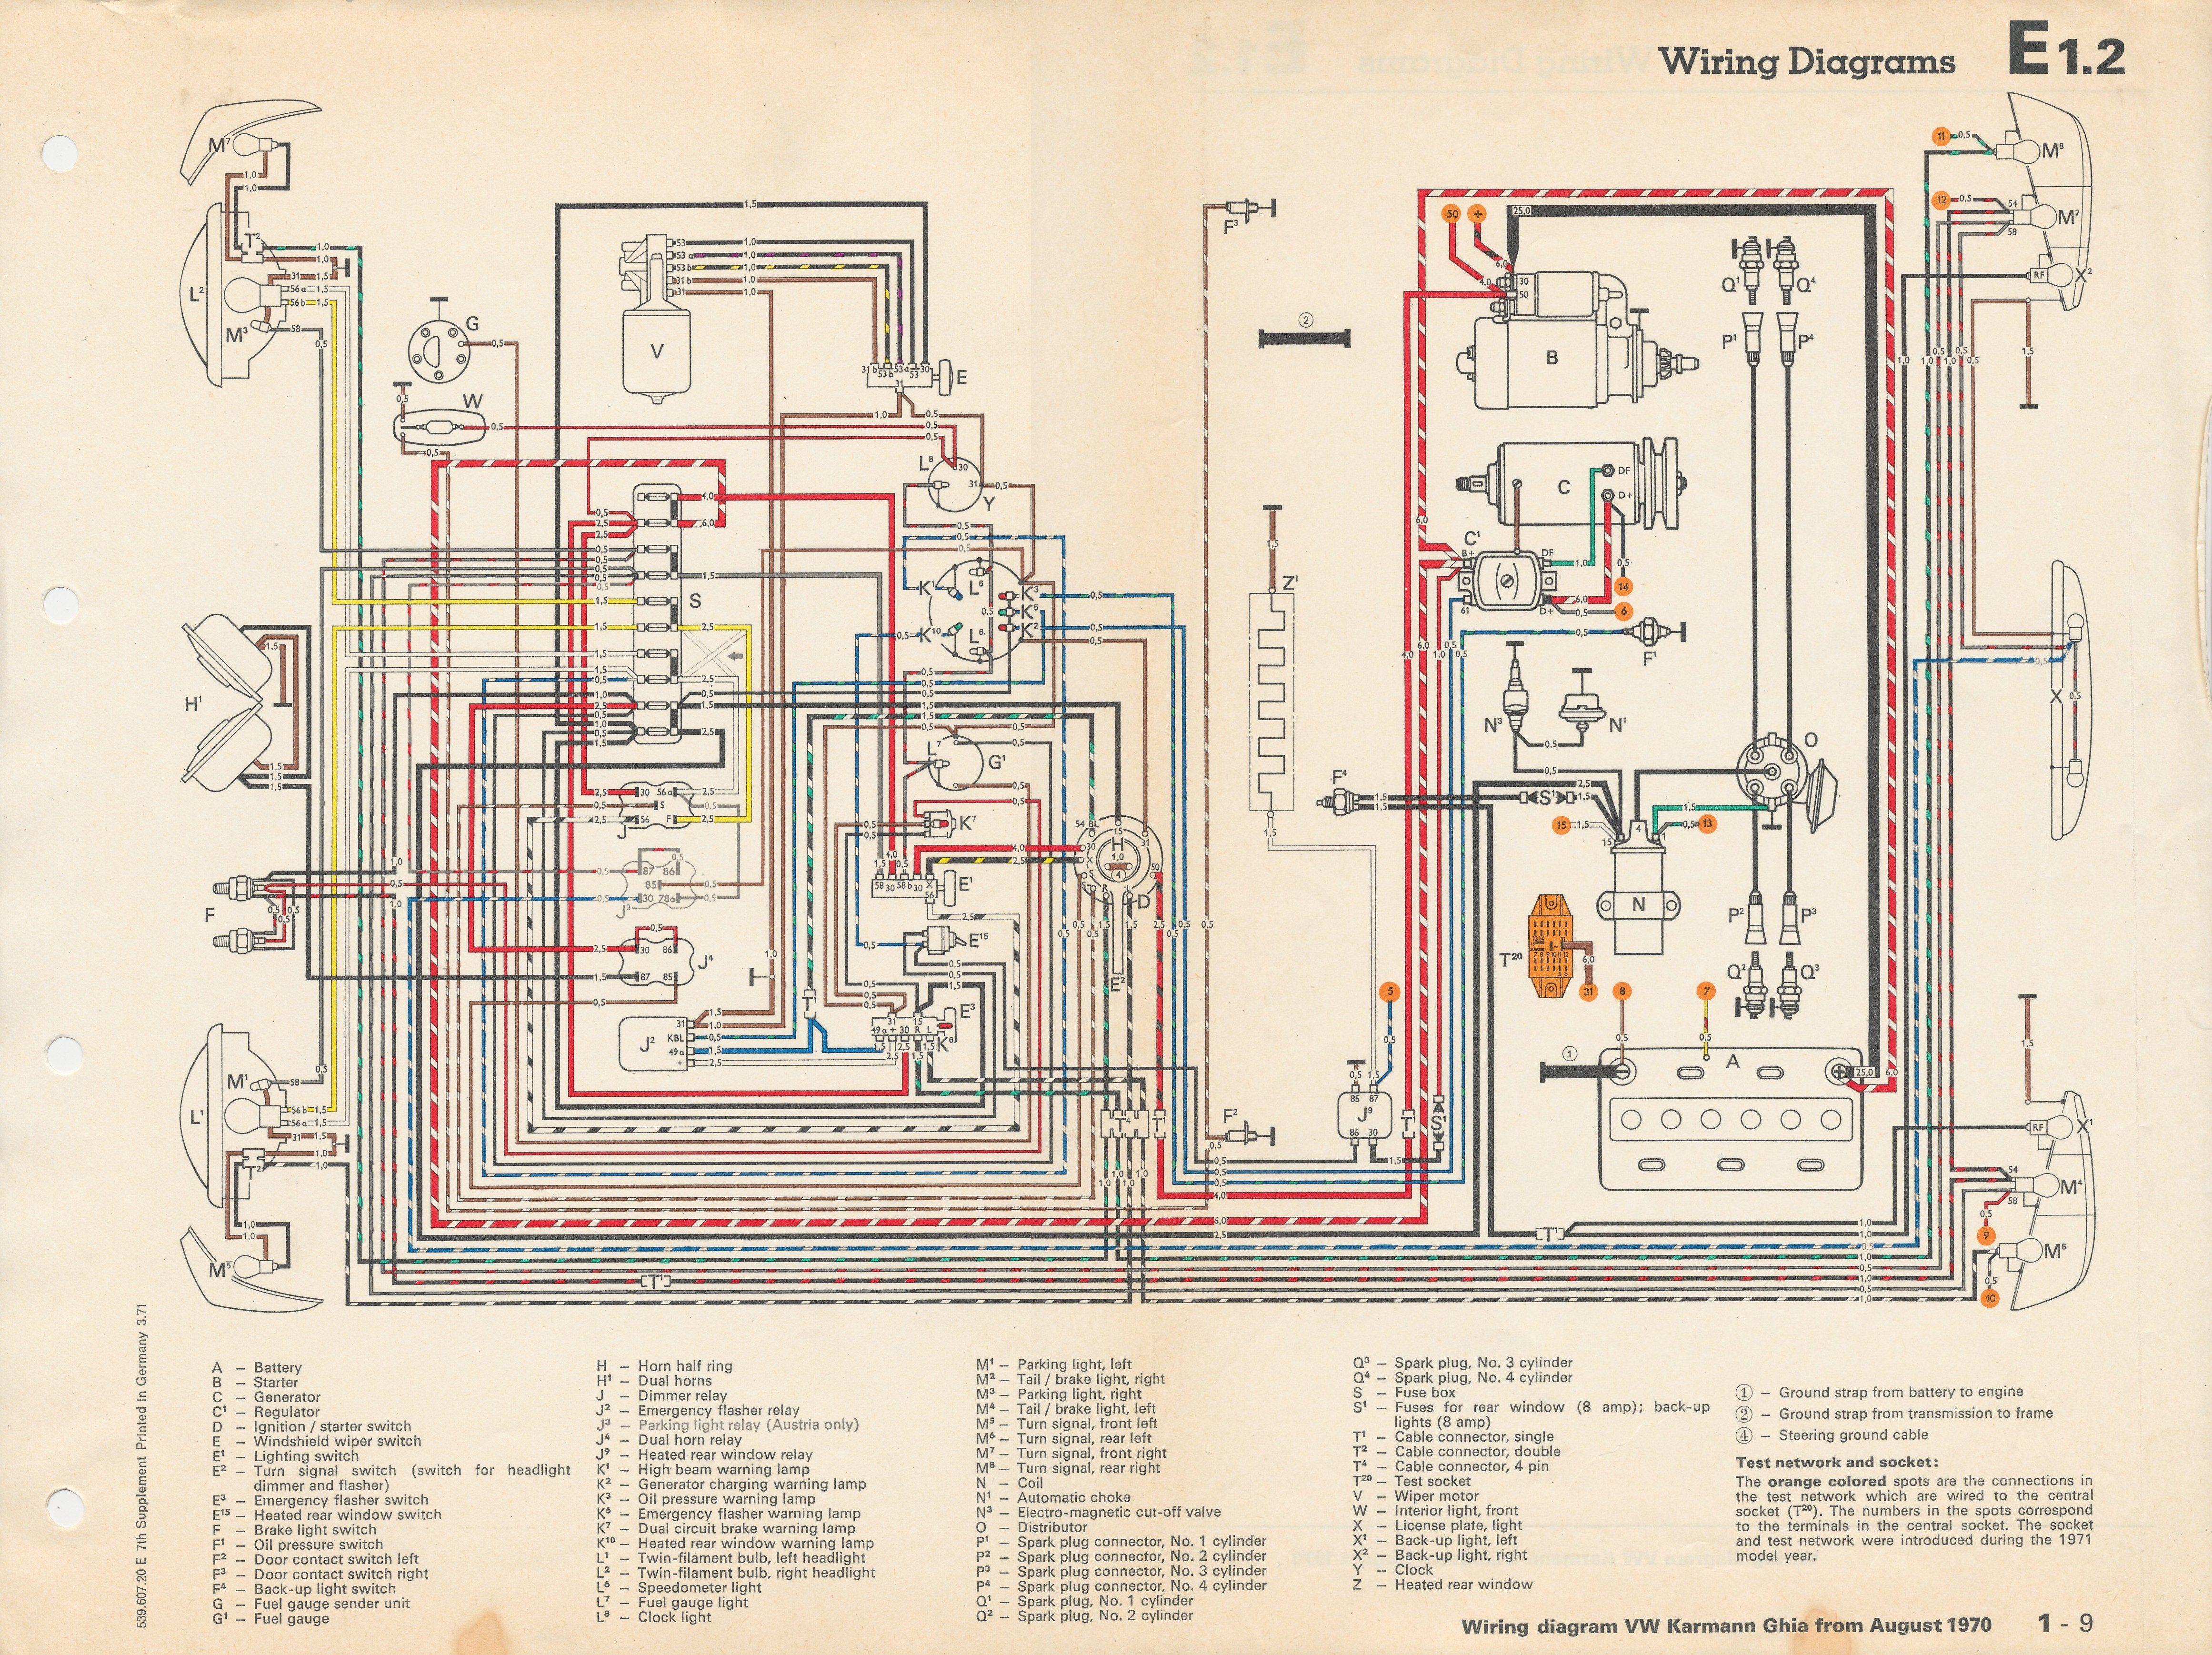 medium resolution of 1971 vw karmann ghia wiring diagram thesamba com karmann ghia rh pinterest com 1969 vw beetle